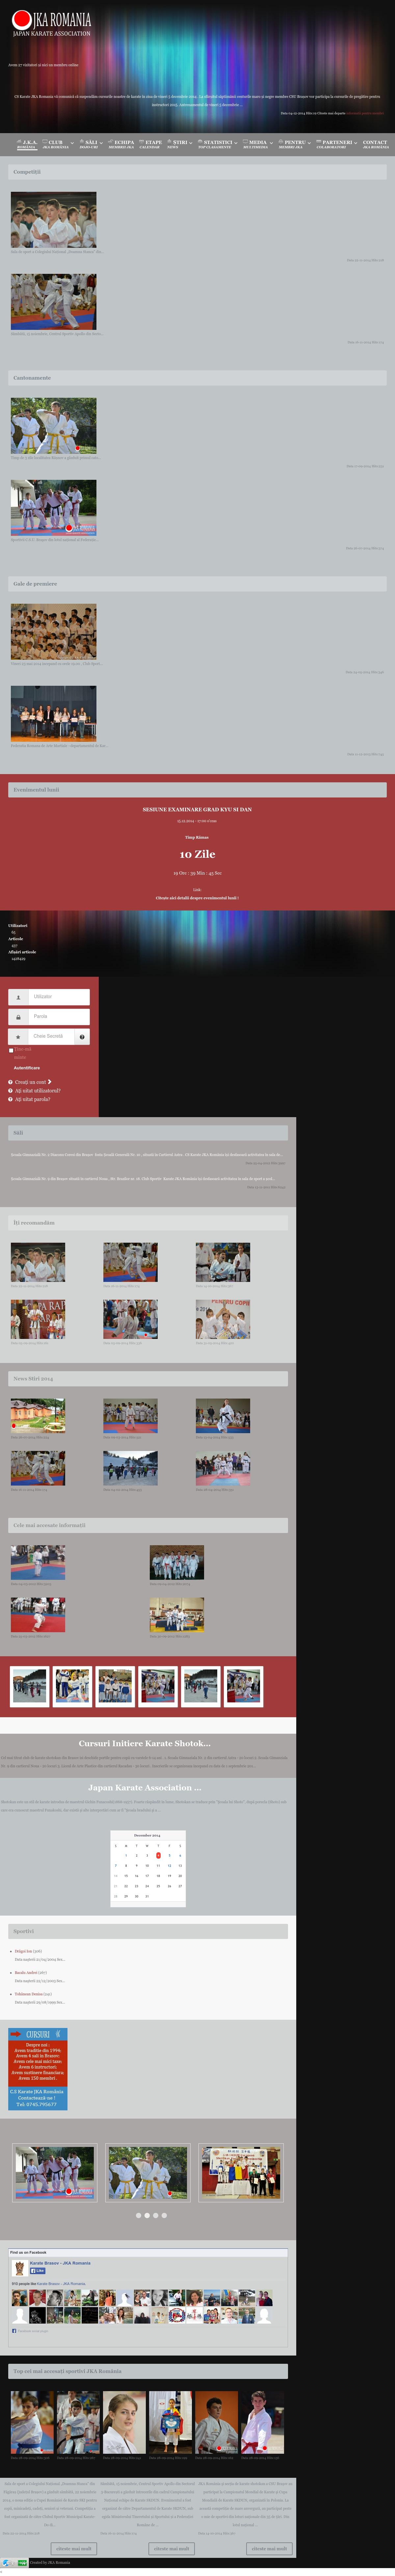 Club sportiv Karate JKA Romania